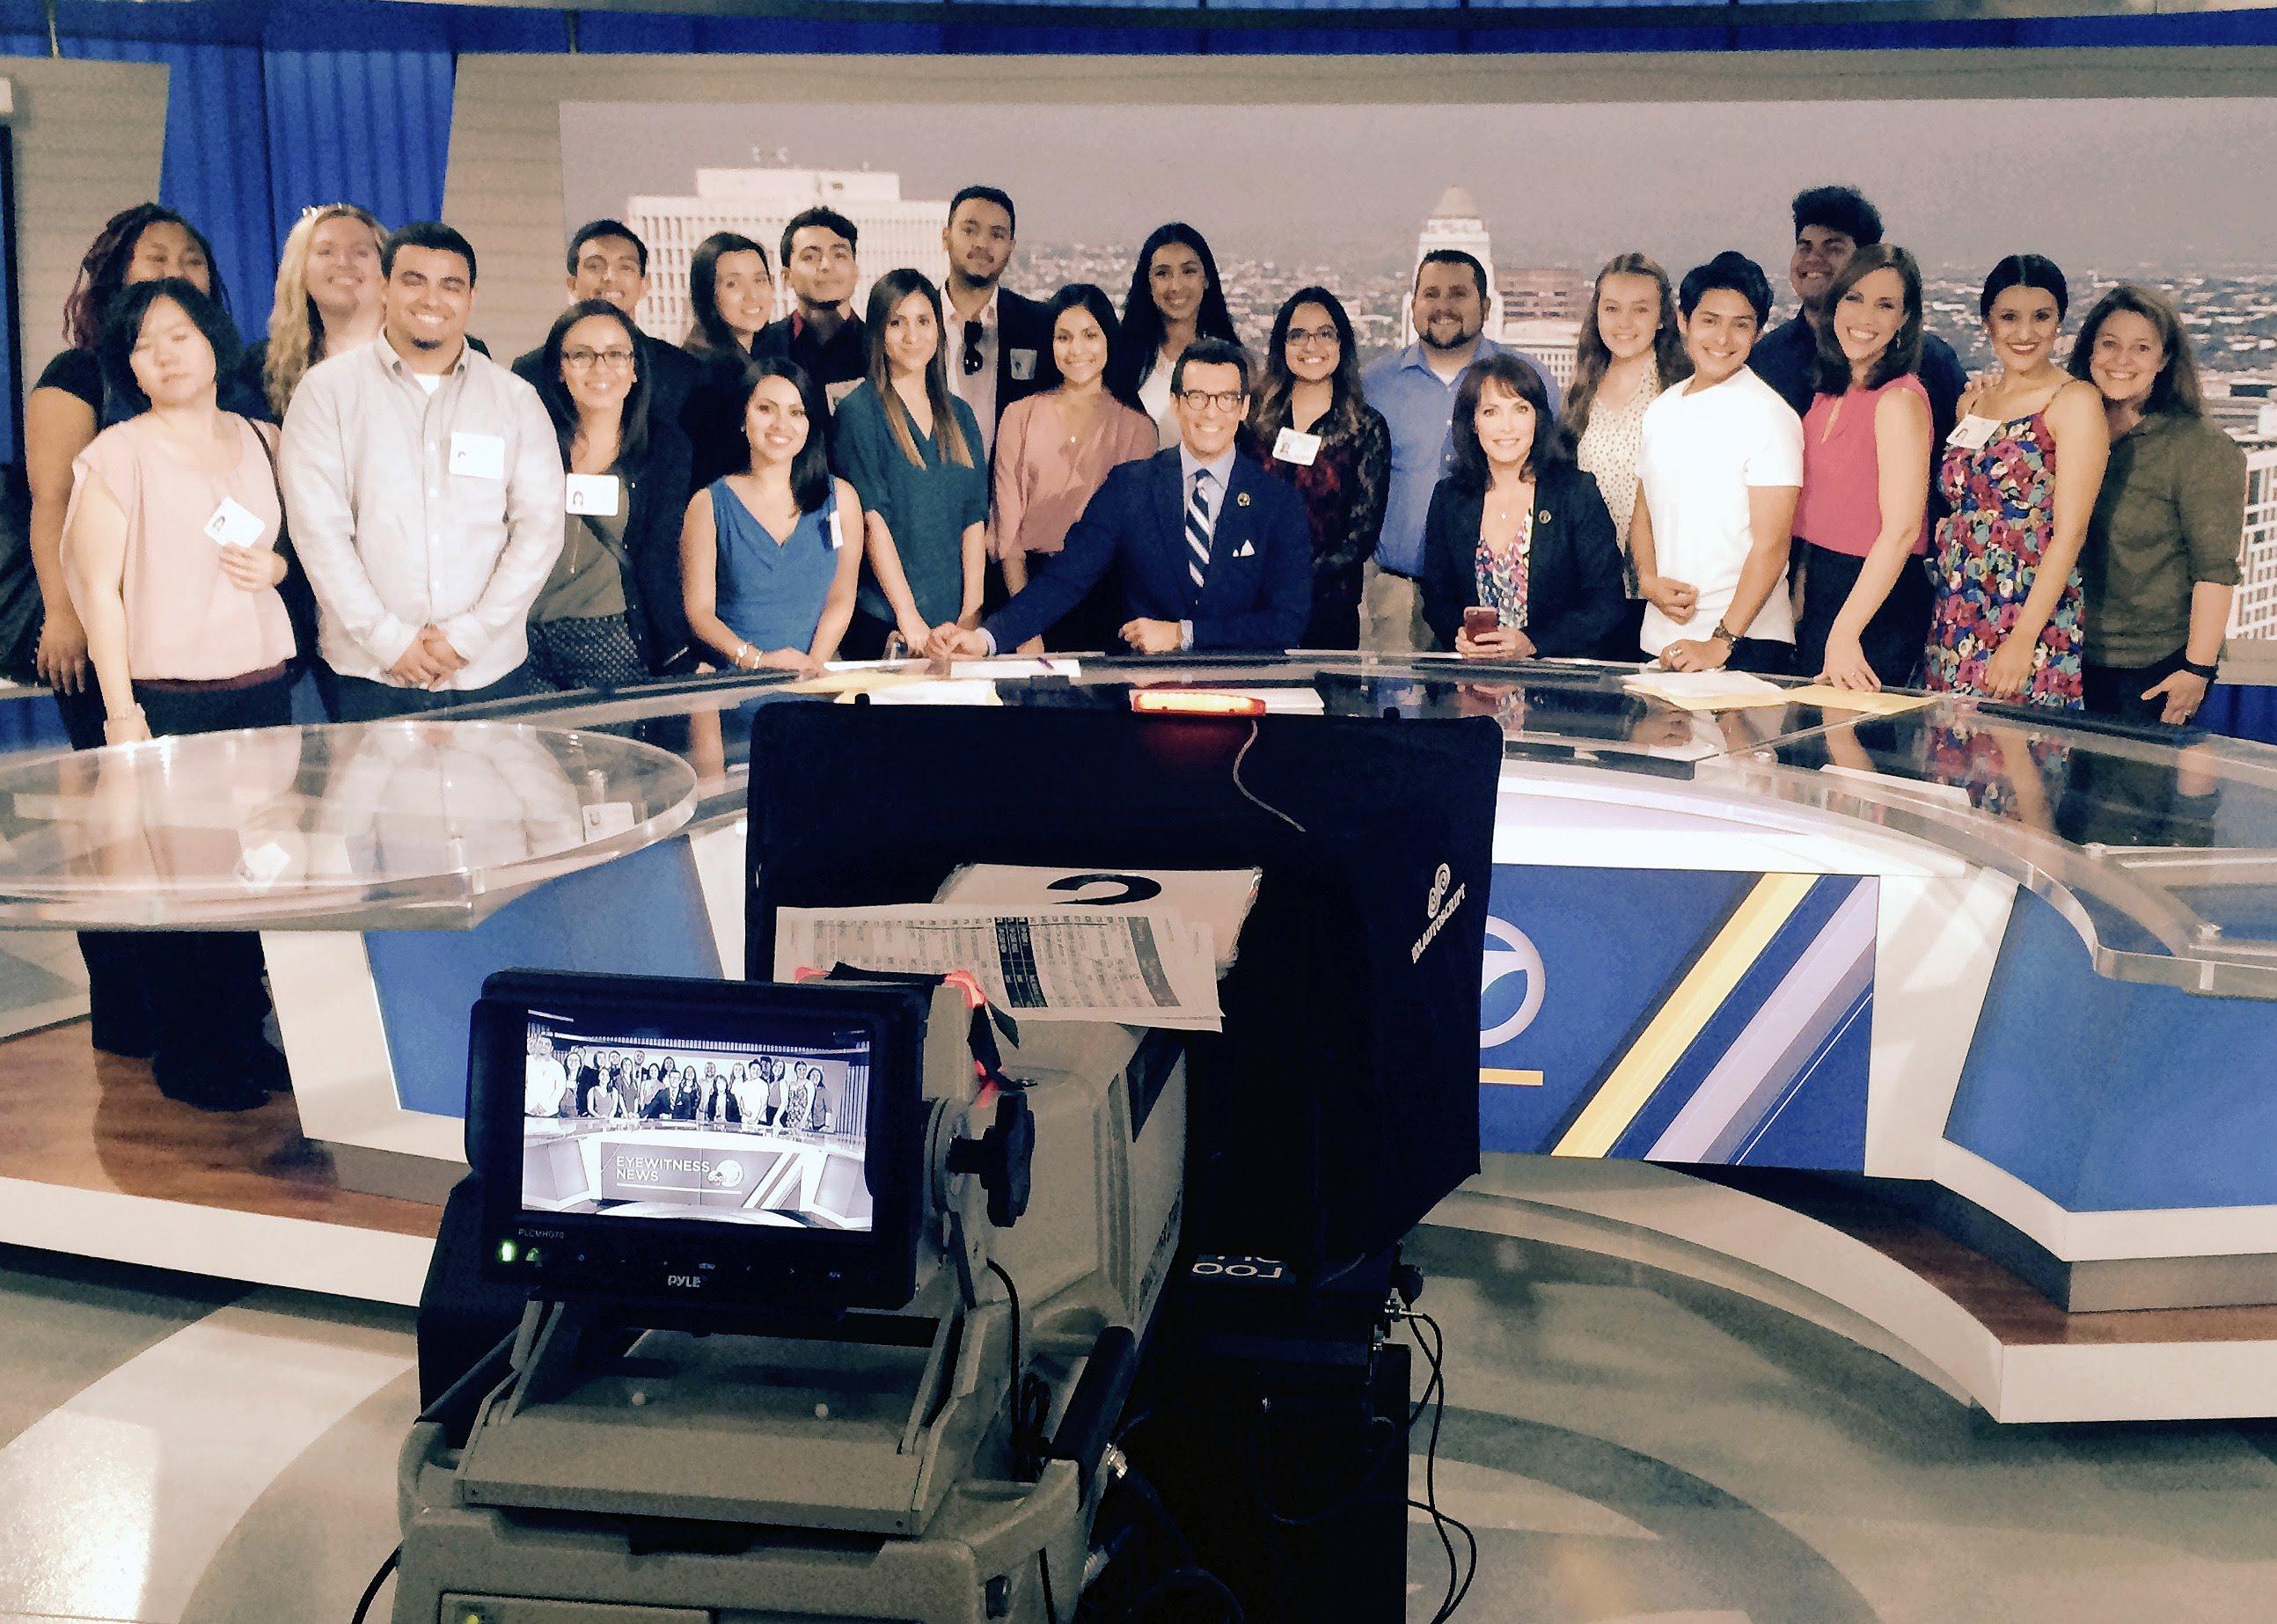 Los Angeles TV studio tour - May 2016